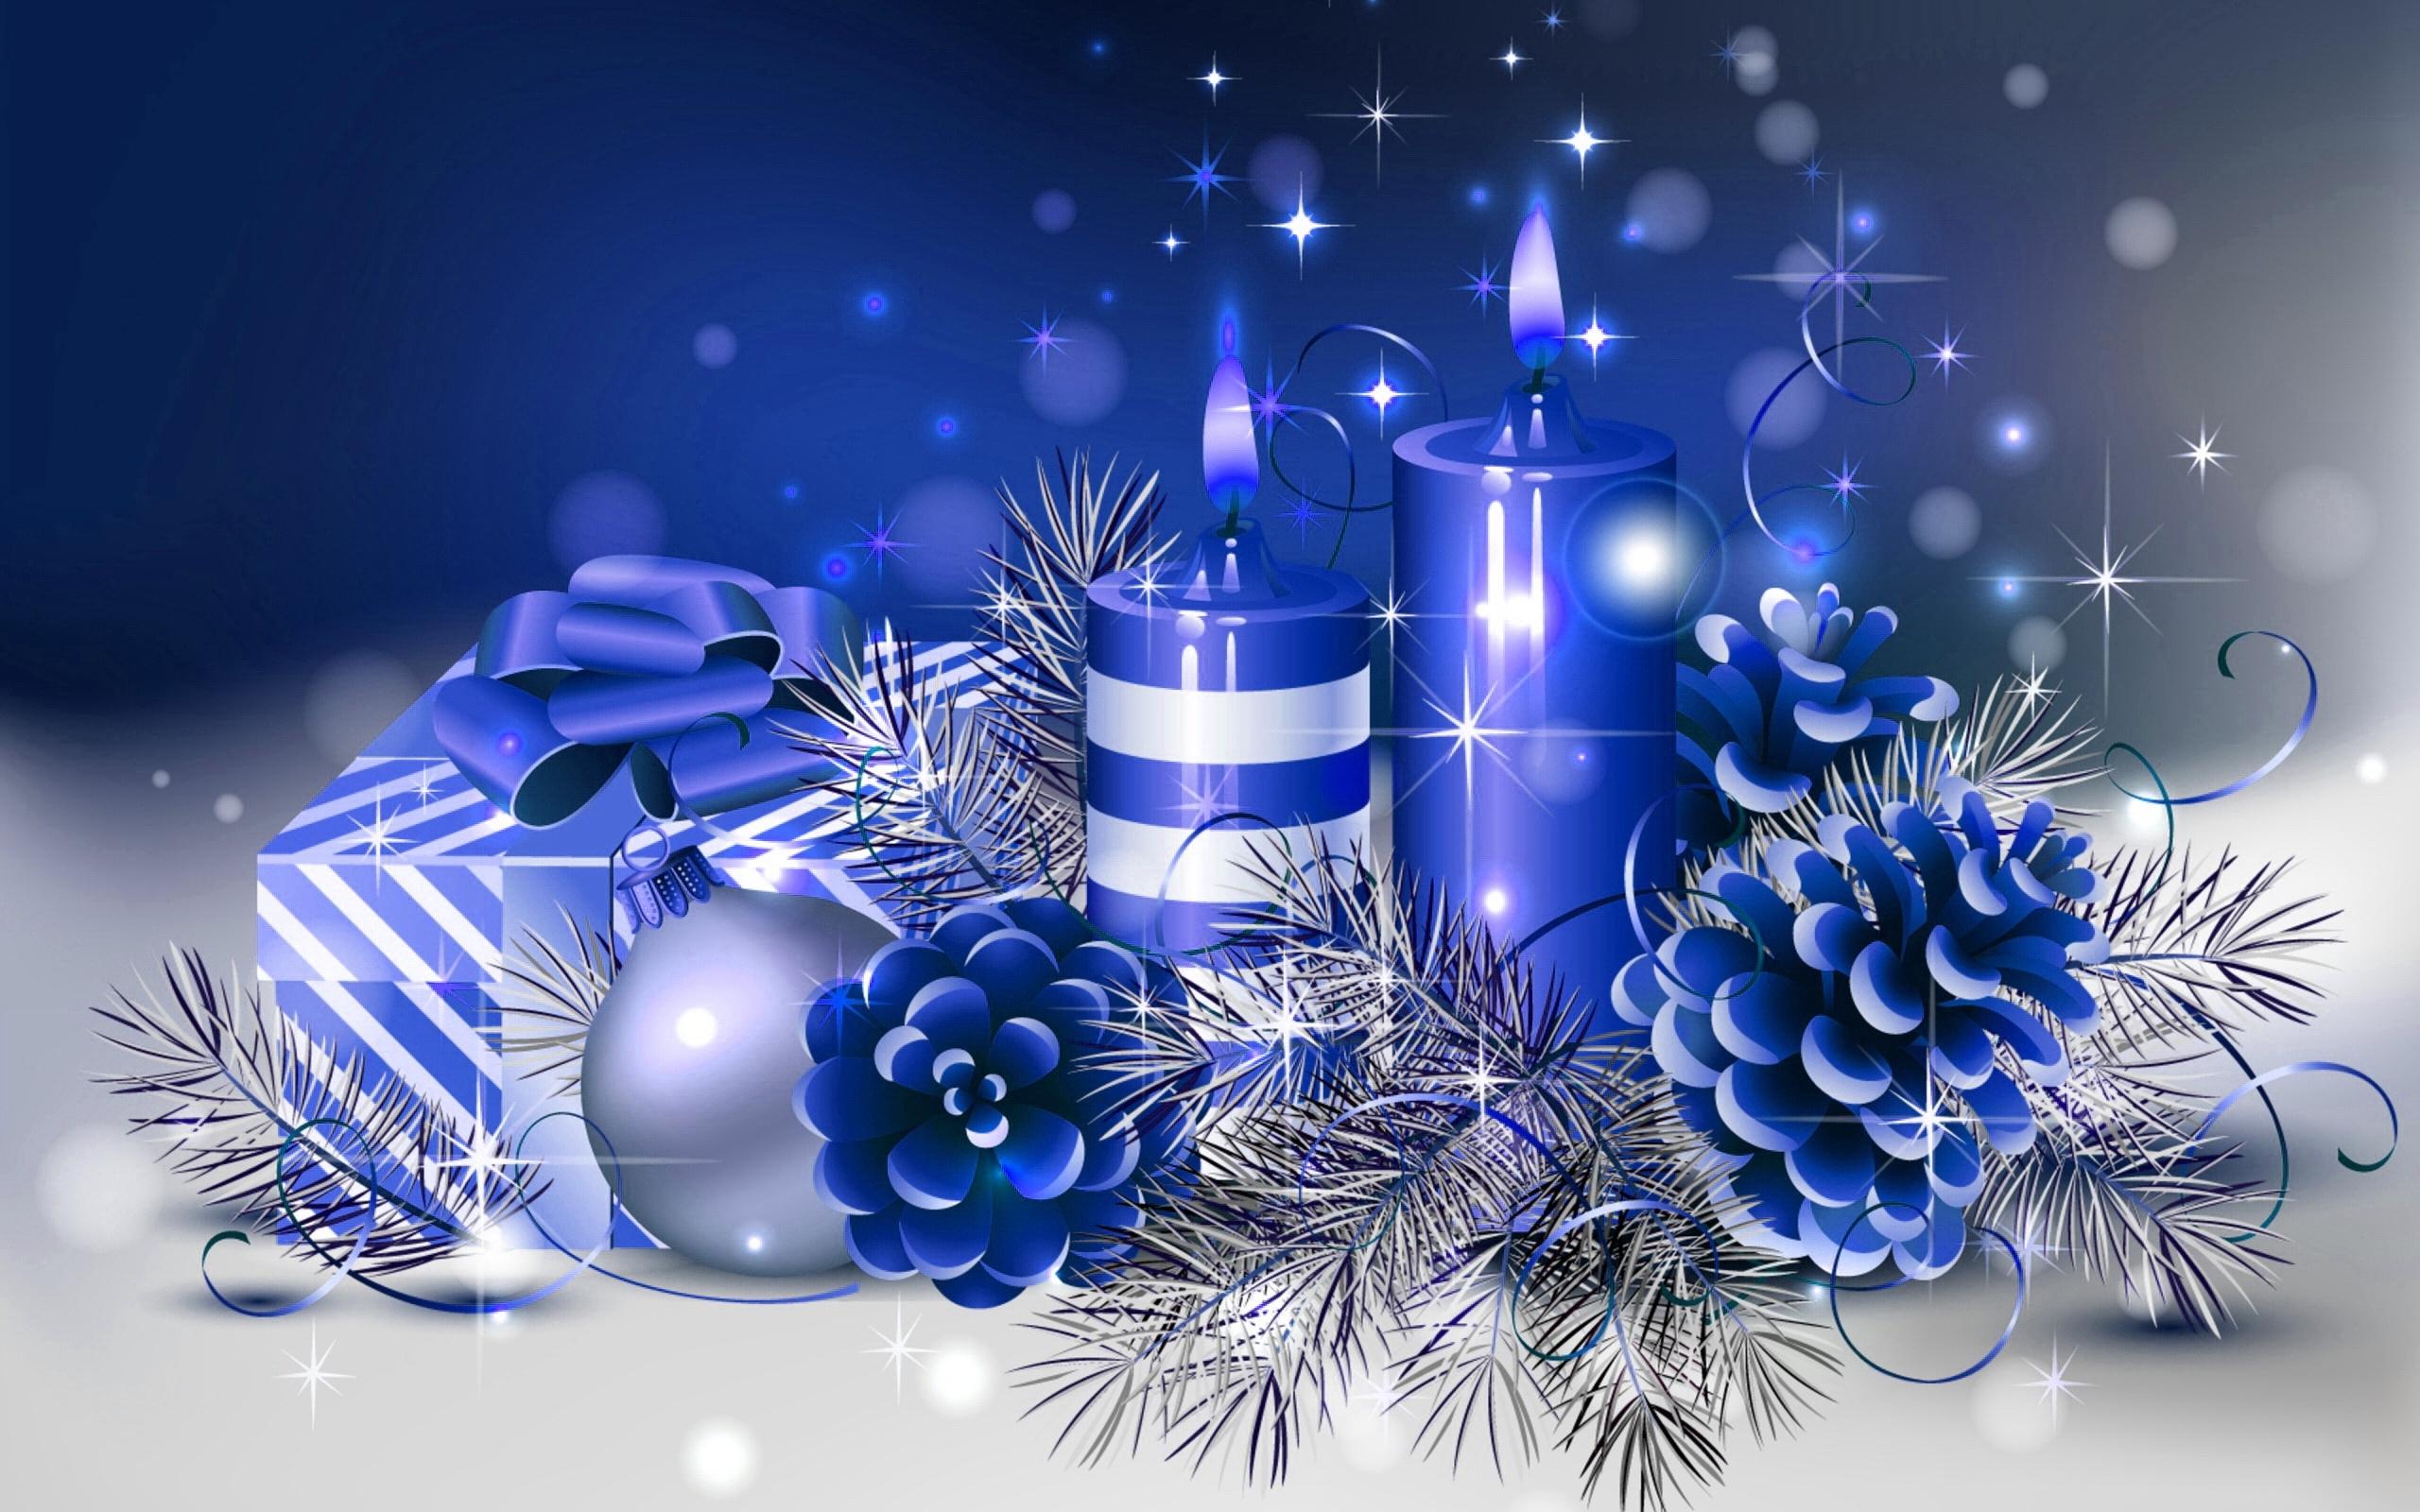 blue christmas wallpaper hd | pixelstalk